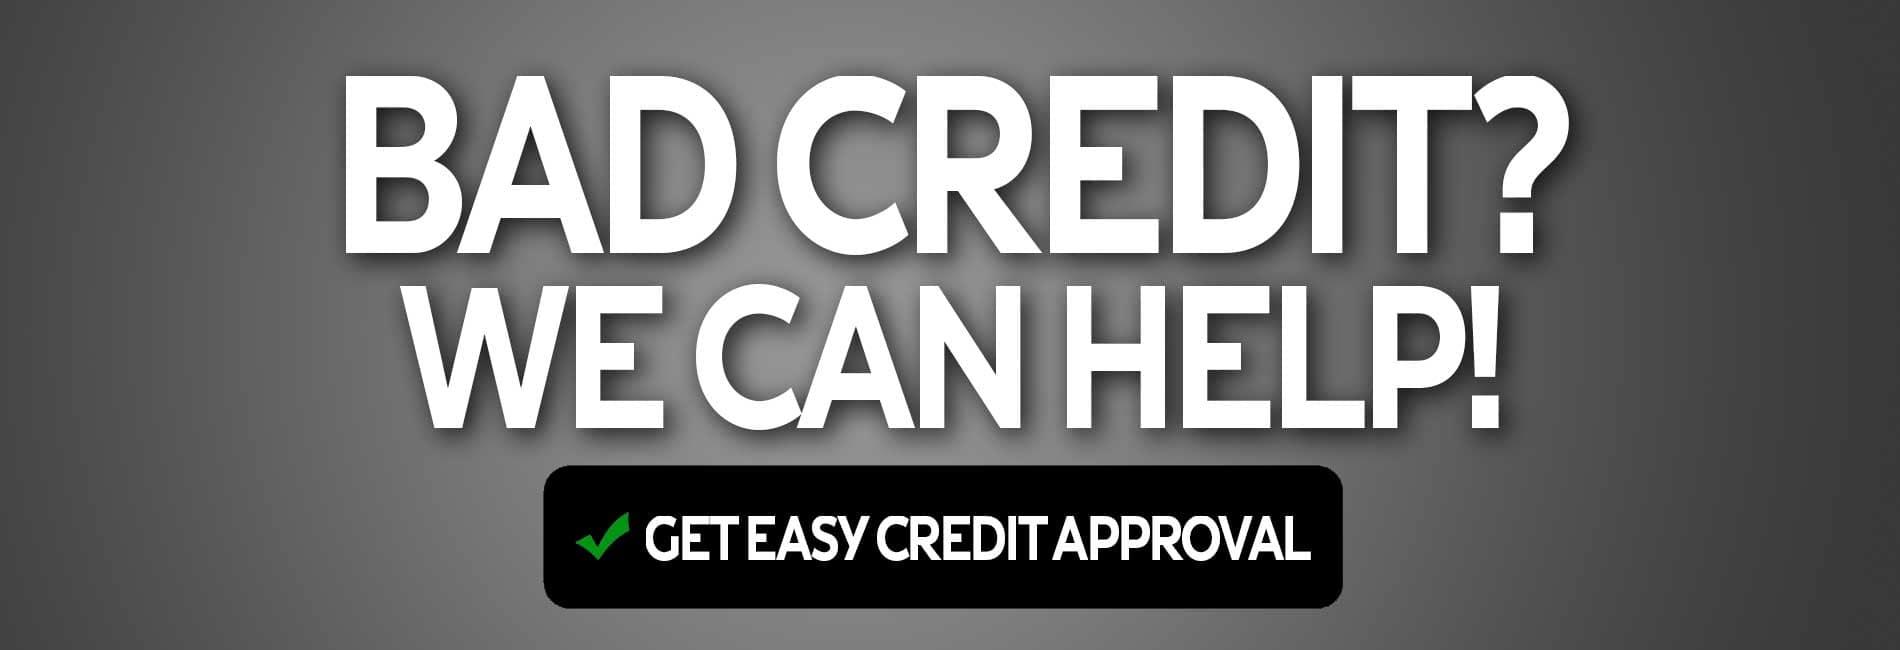 Bad Credit? Berman INFINITI Chicago can help!